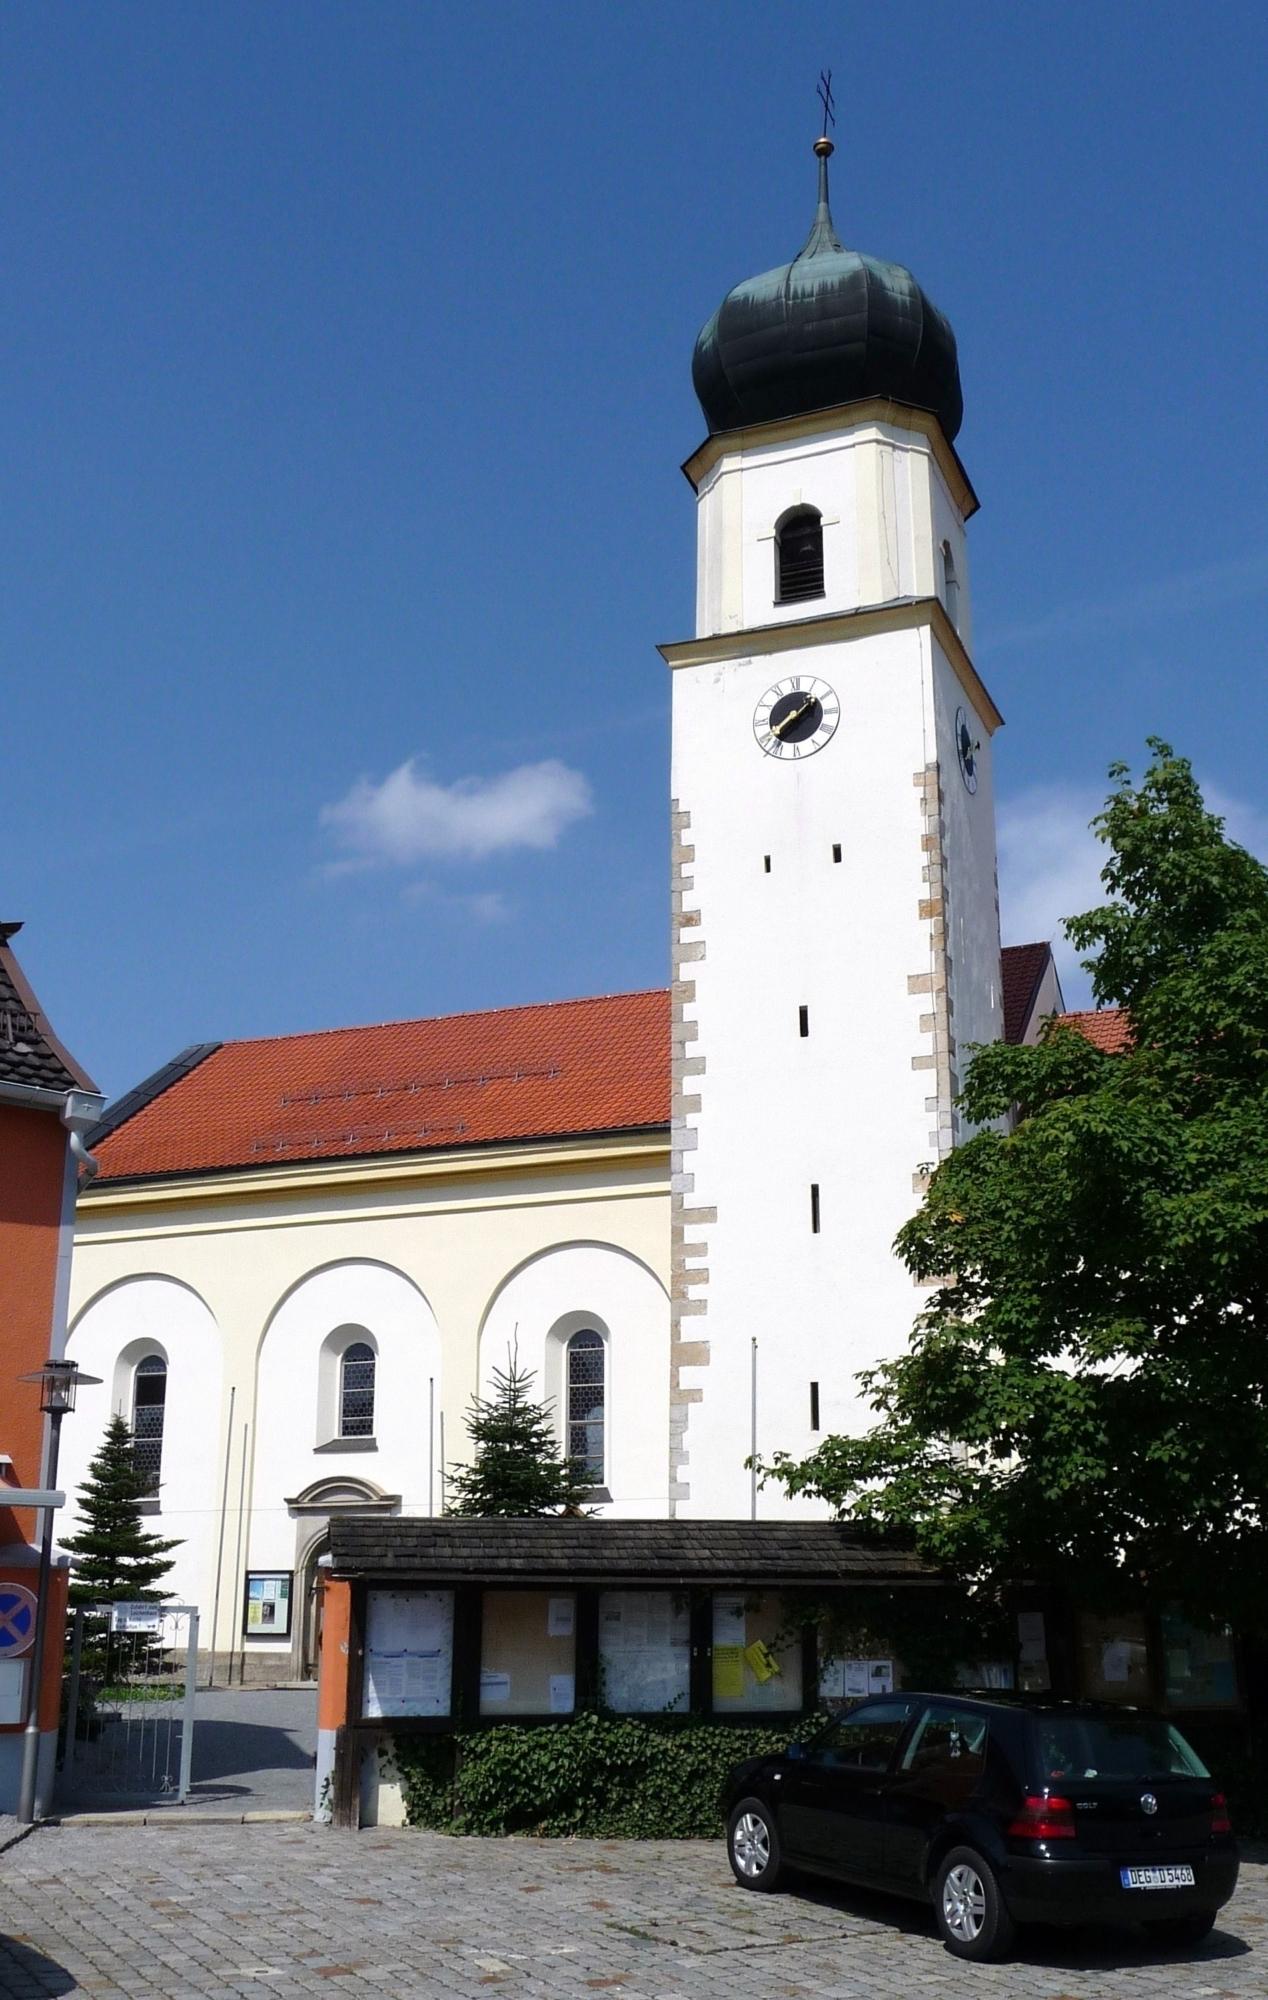 Pfarrkirche Iggensbach